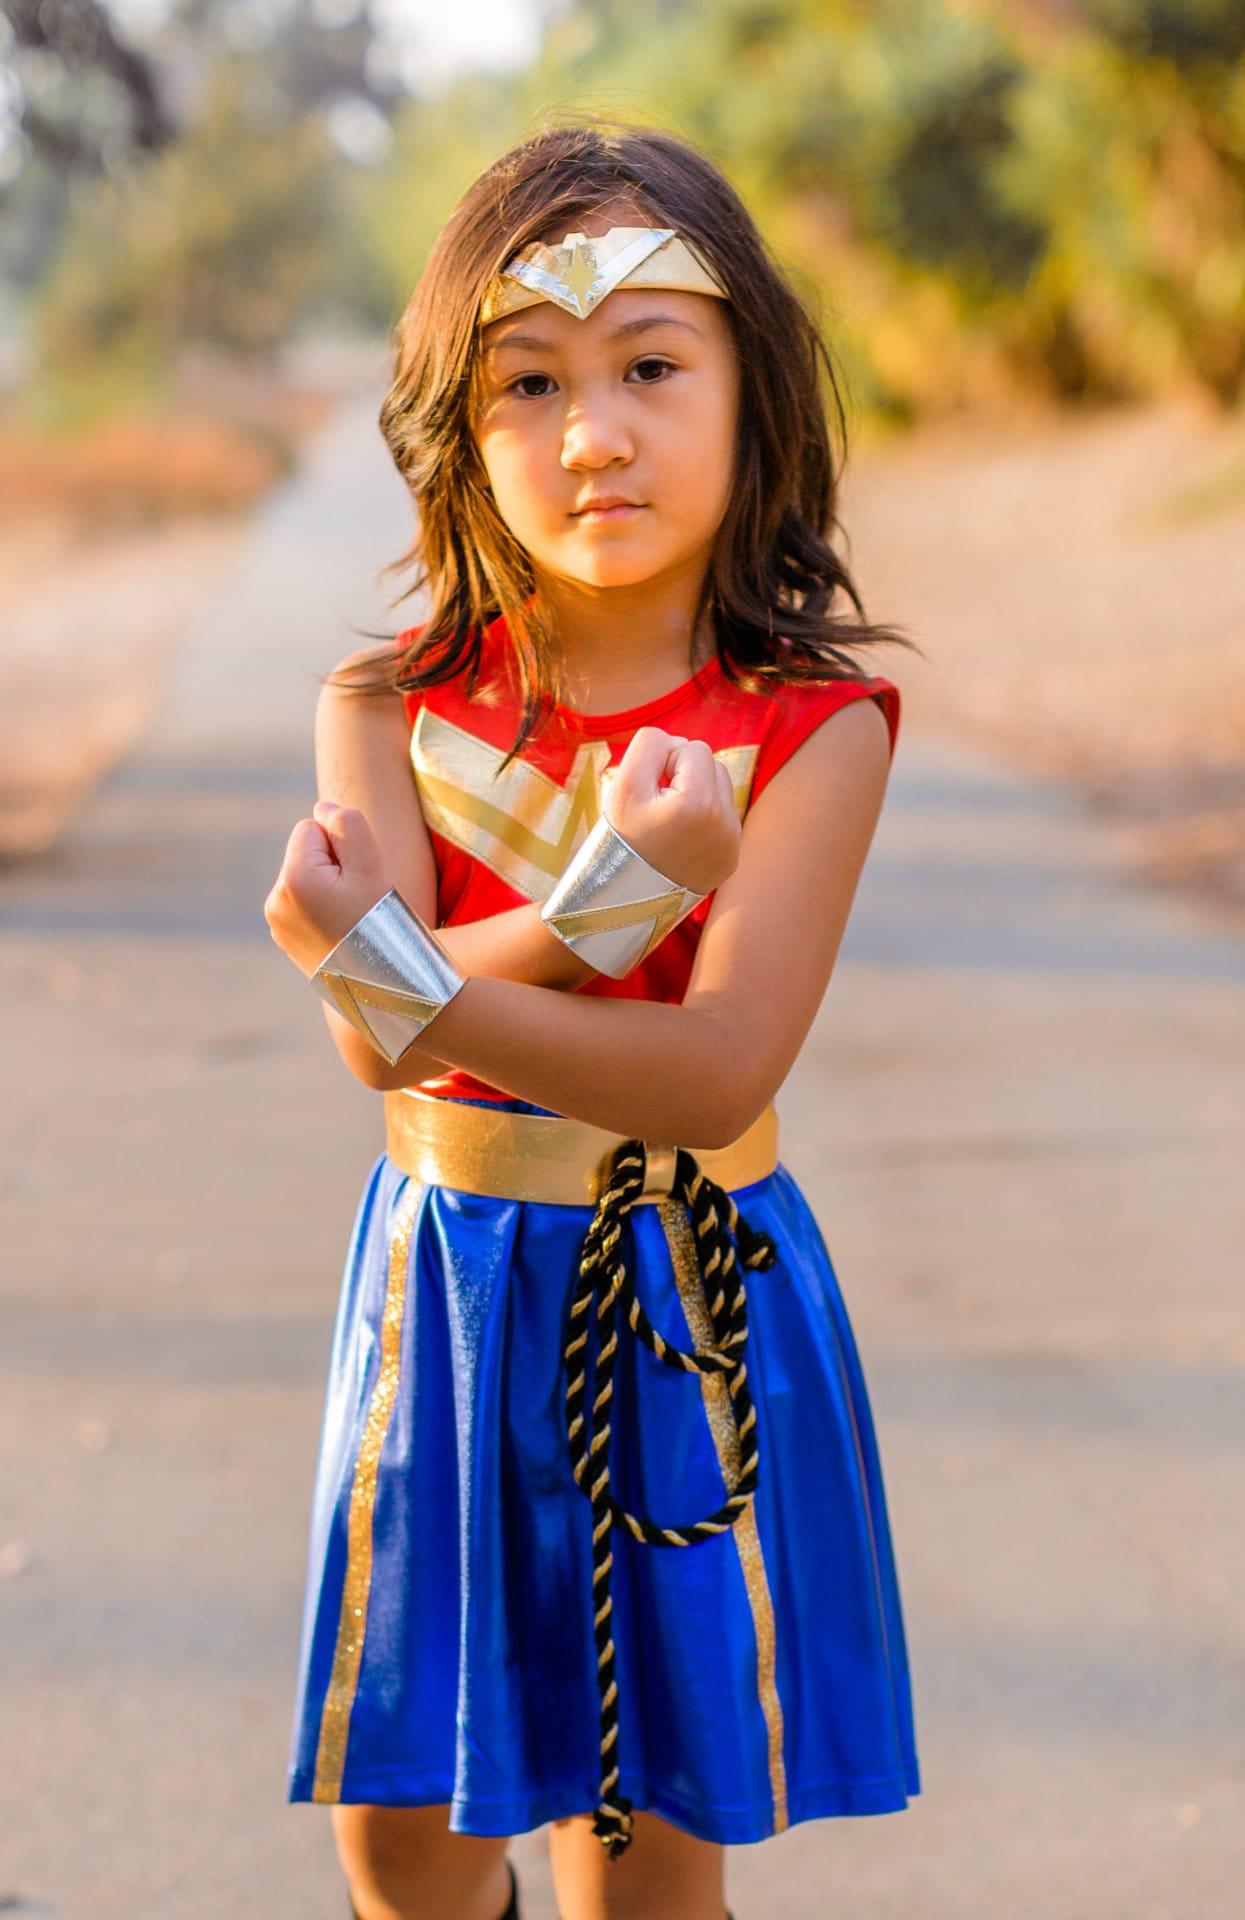 4 People Halloween Costumes Girls.Wonder Woman Girls Costume Inspired Kids Halloween Costume Girls